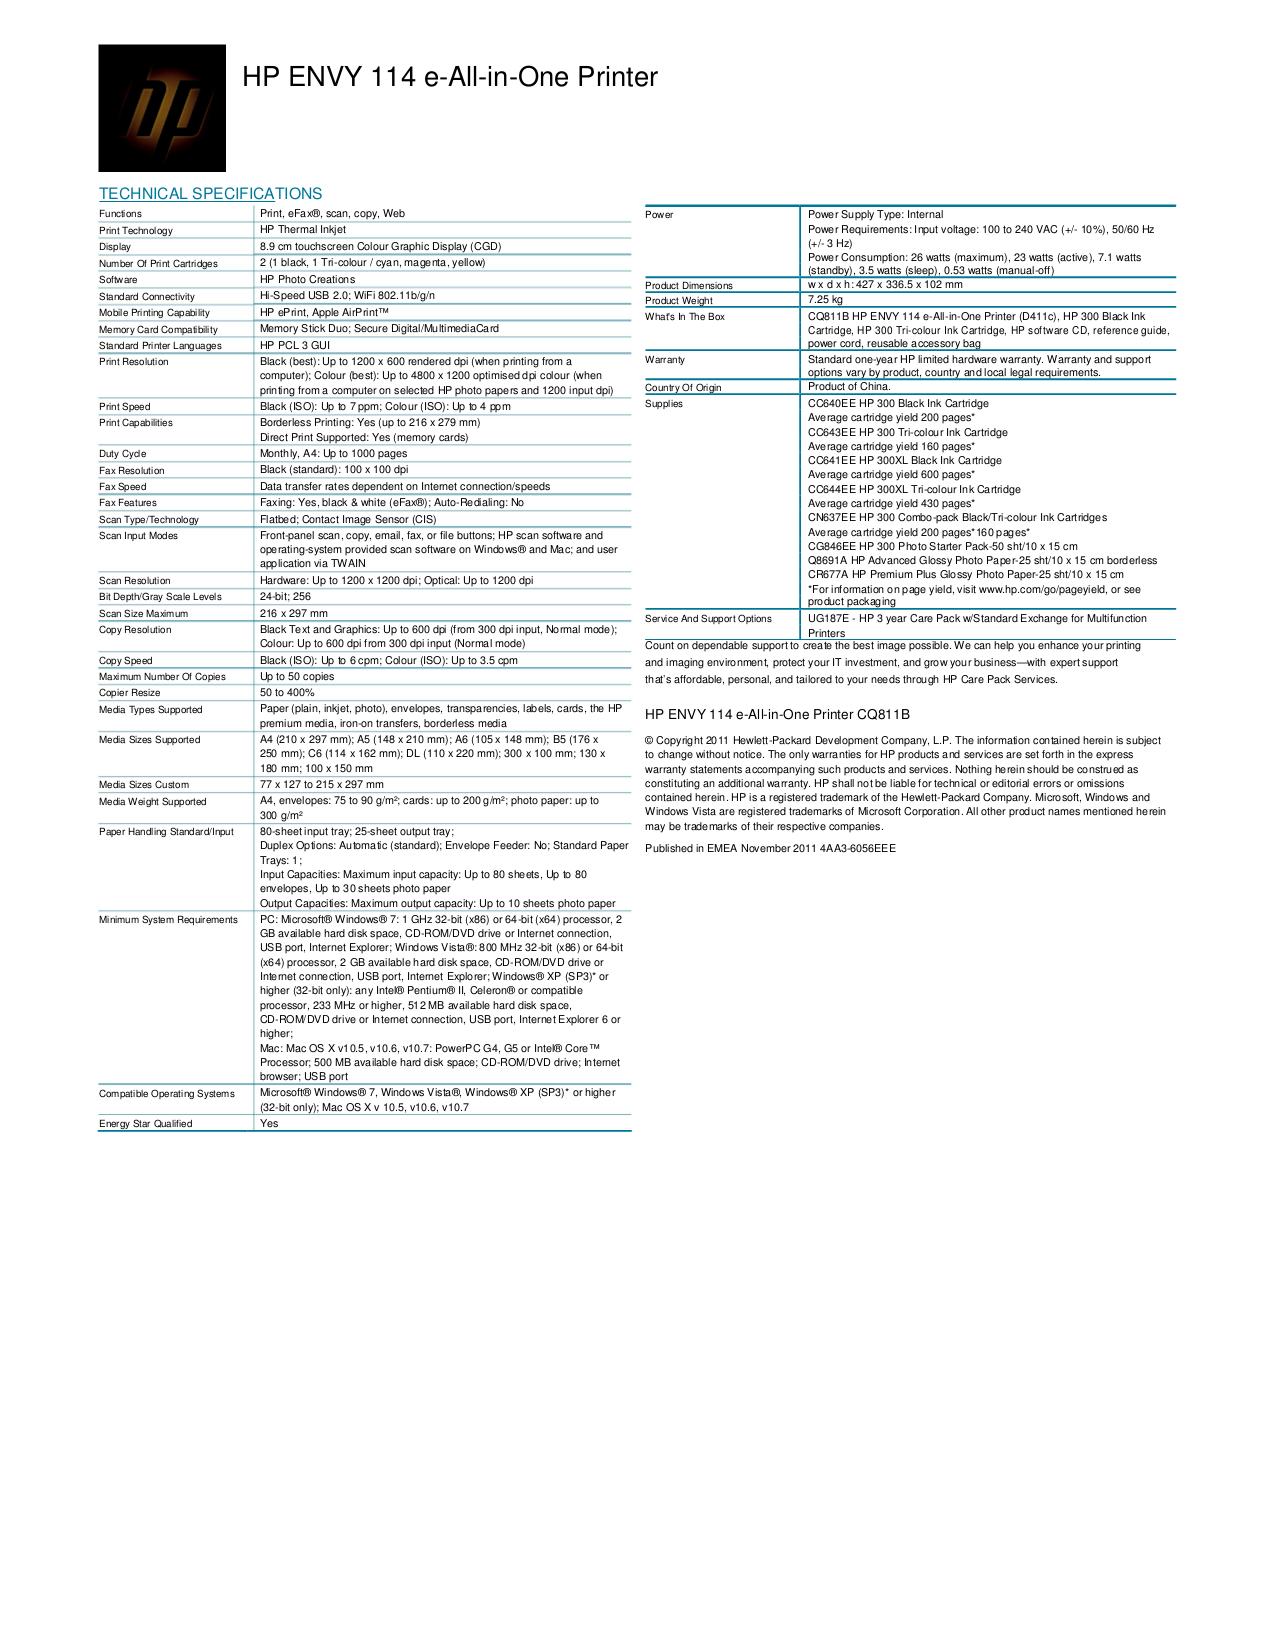 download free pdf for hp envy 114 multifunction printer manual rh umlib com  hp envy 114 manual